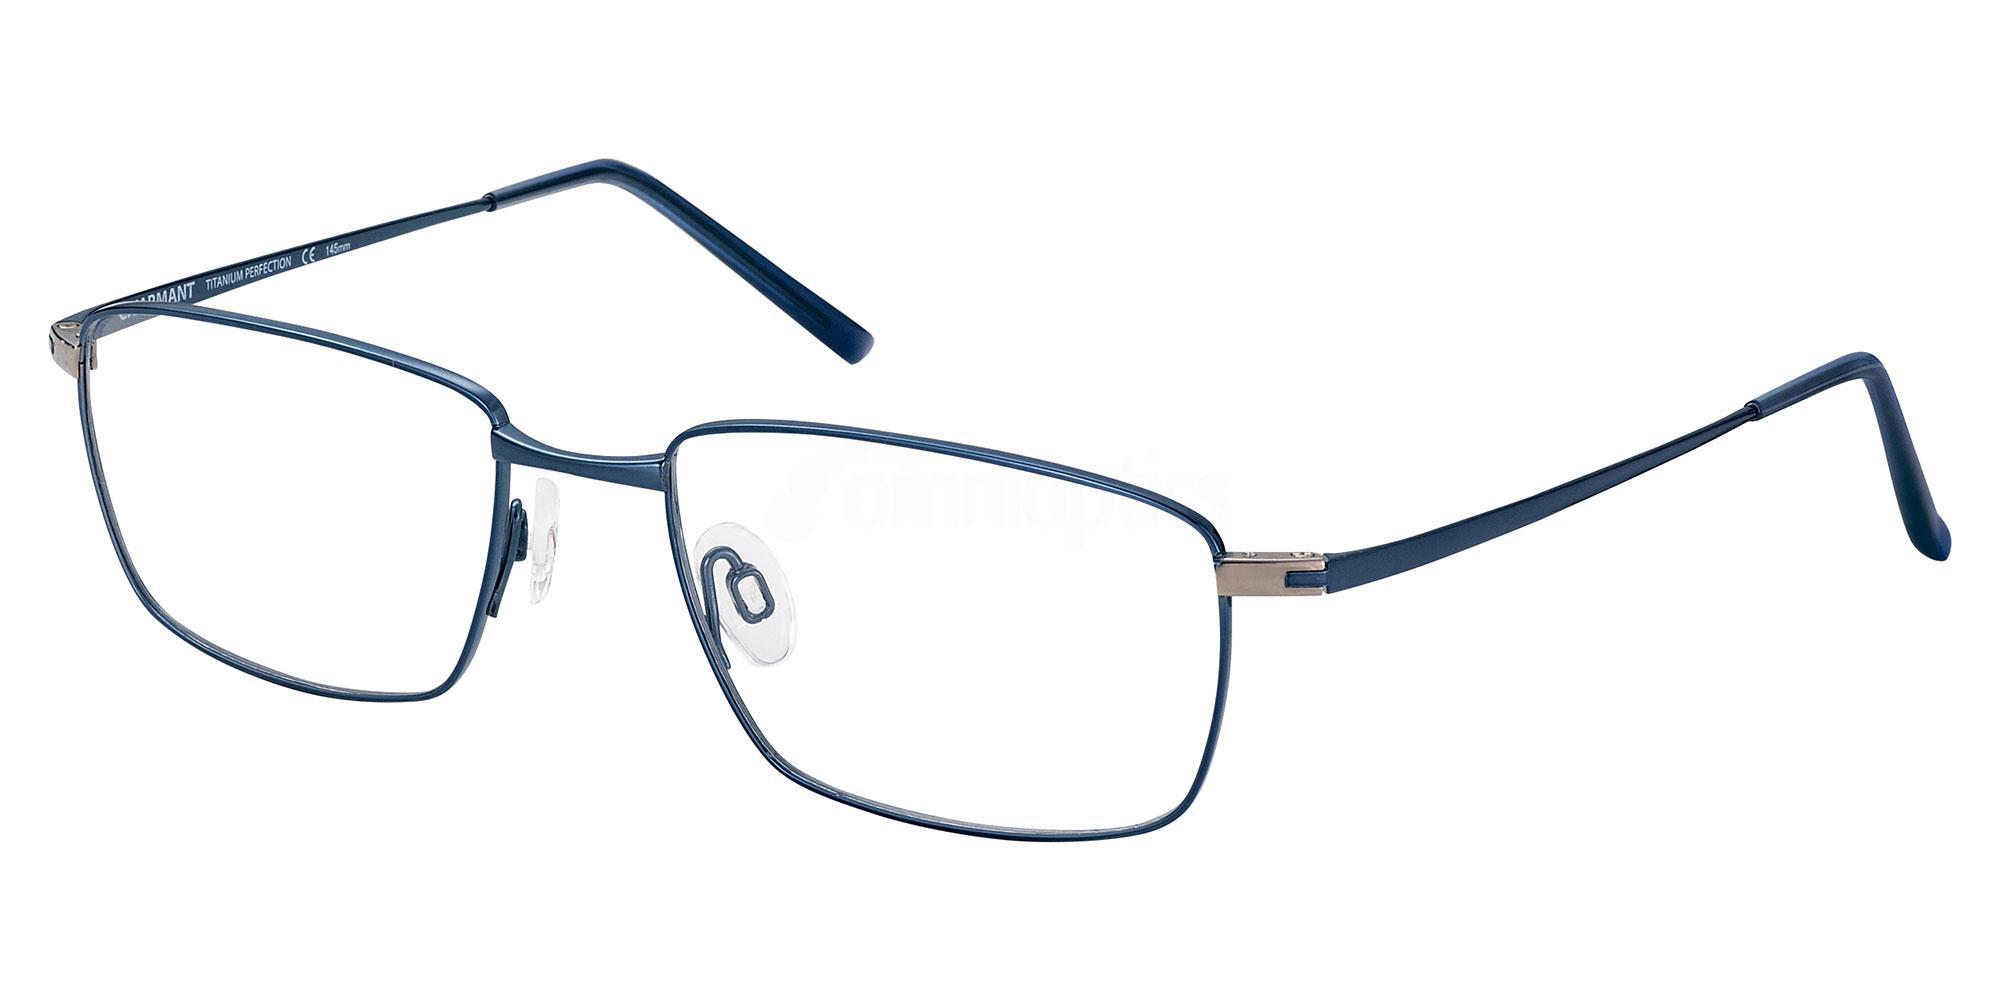 BL CH11447 Glasses, Charmant Titanium Perfection